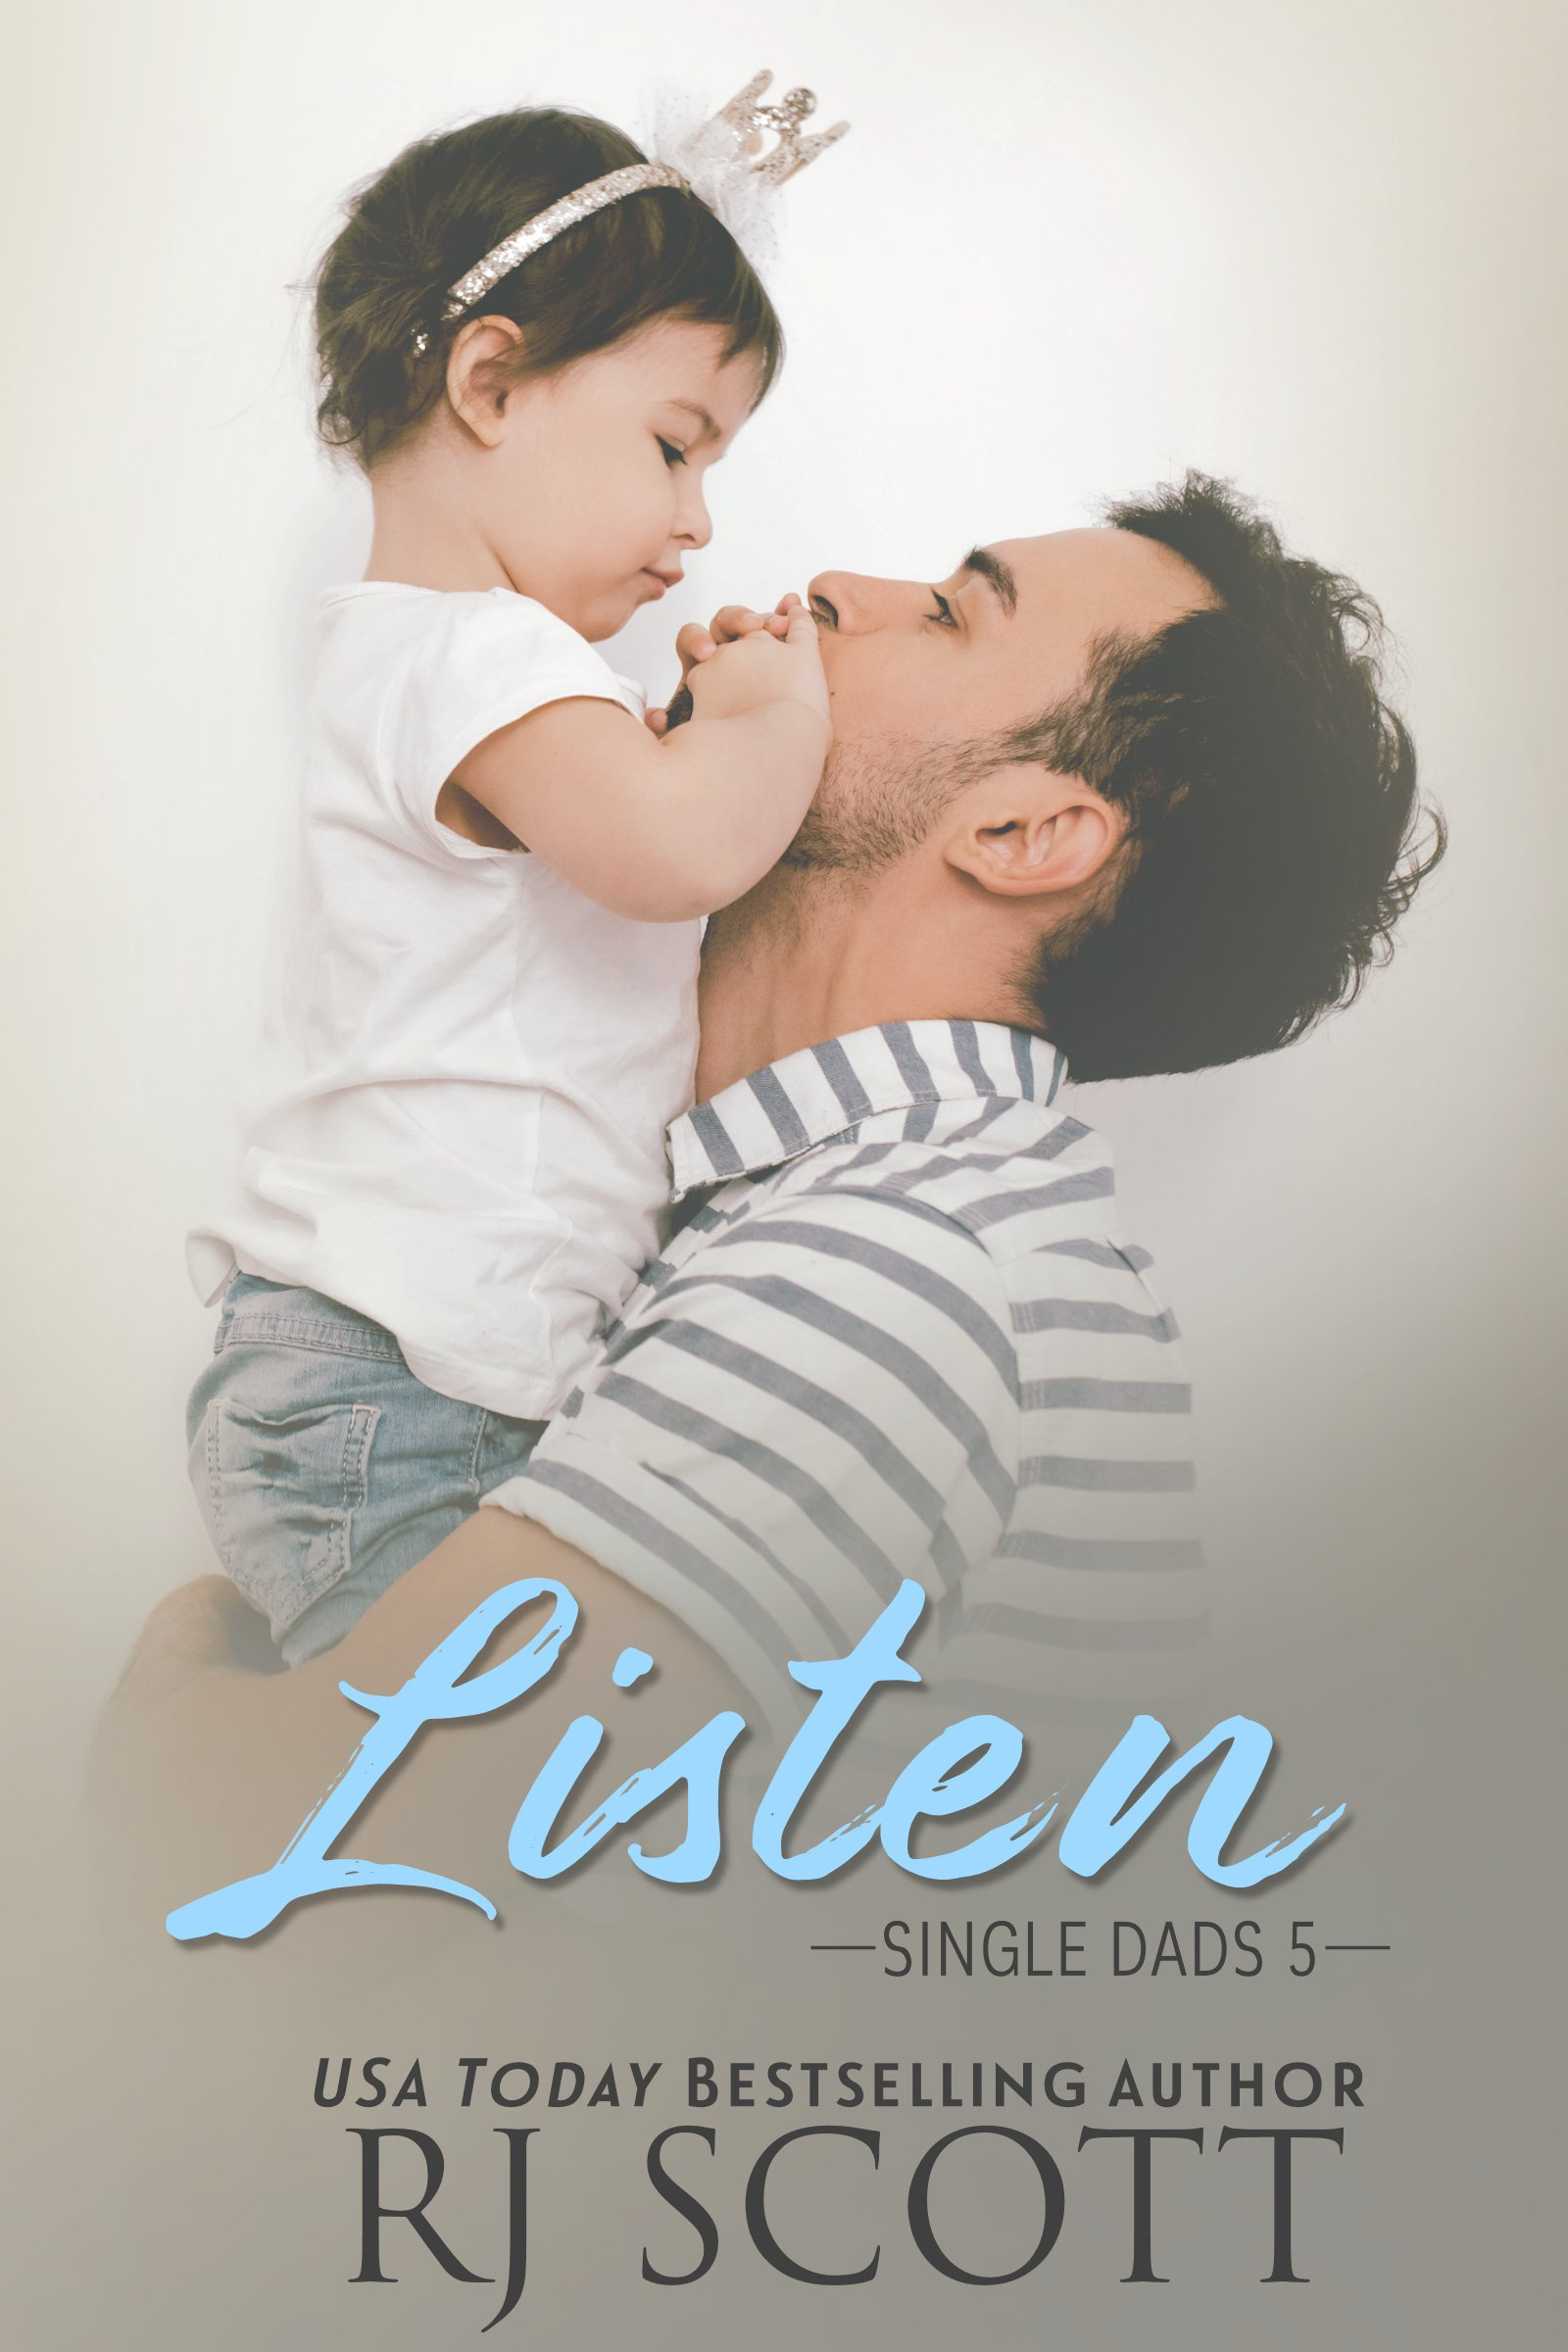 RJ Scott - USA TODAY bestselling romance author